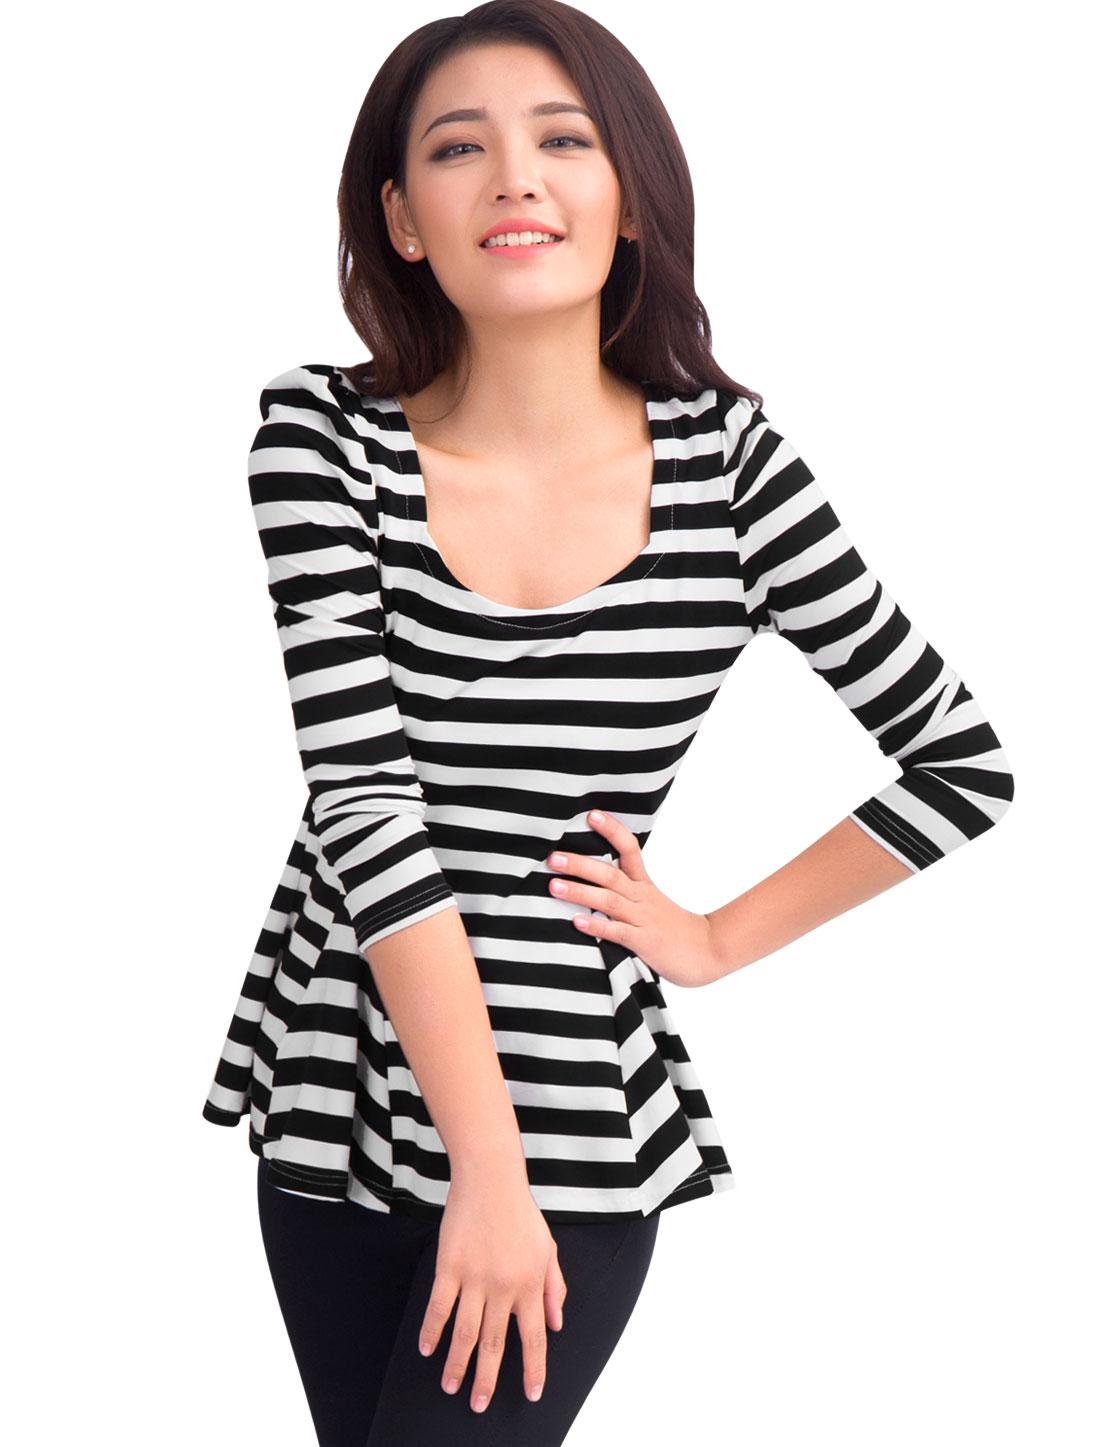 Ladies Scoop Neck Long Puff Sleeve Black White Striped Peplum Top XL